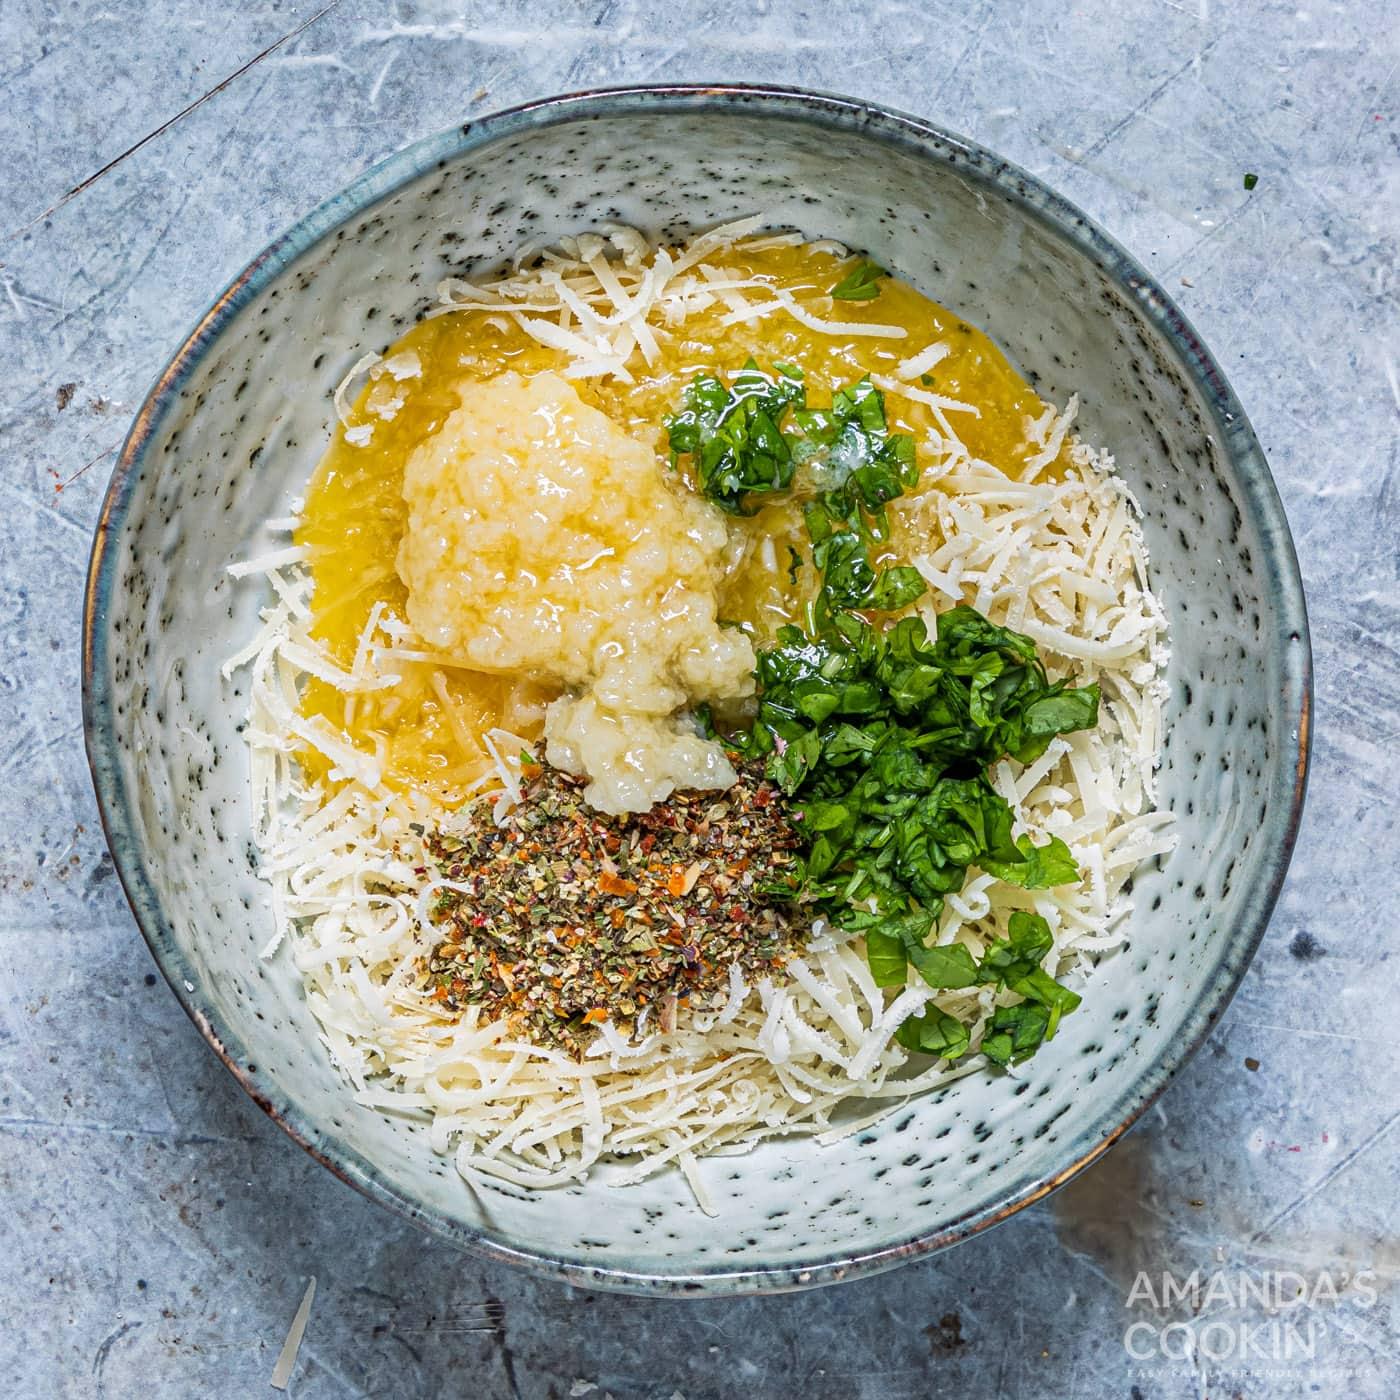 garlic butter ingredients in bowl